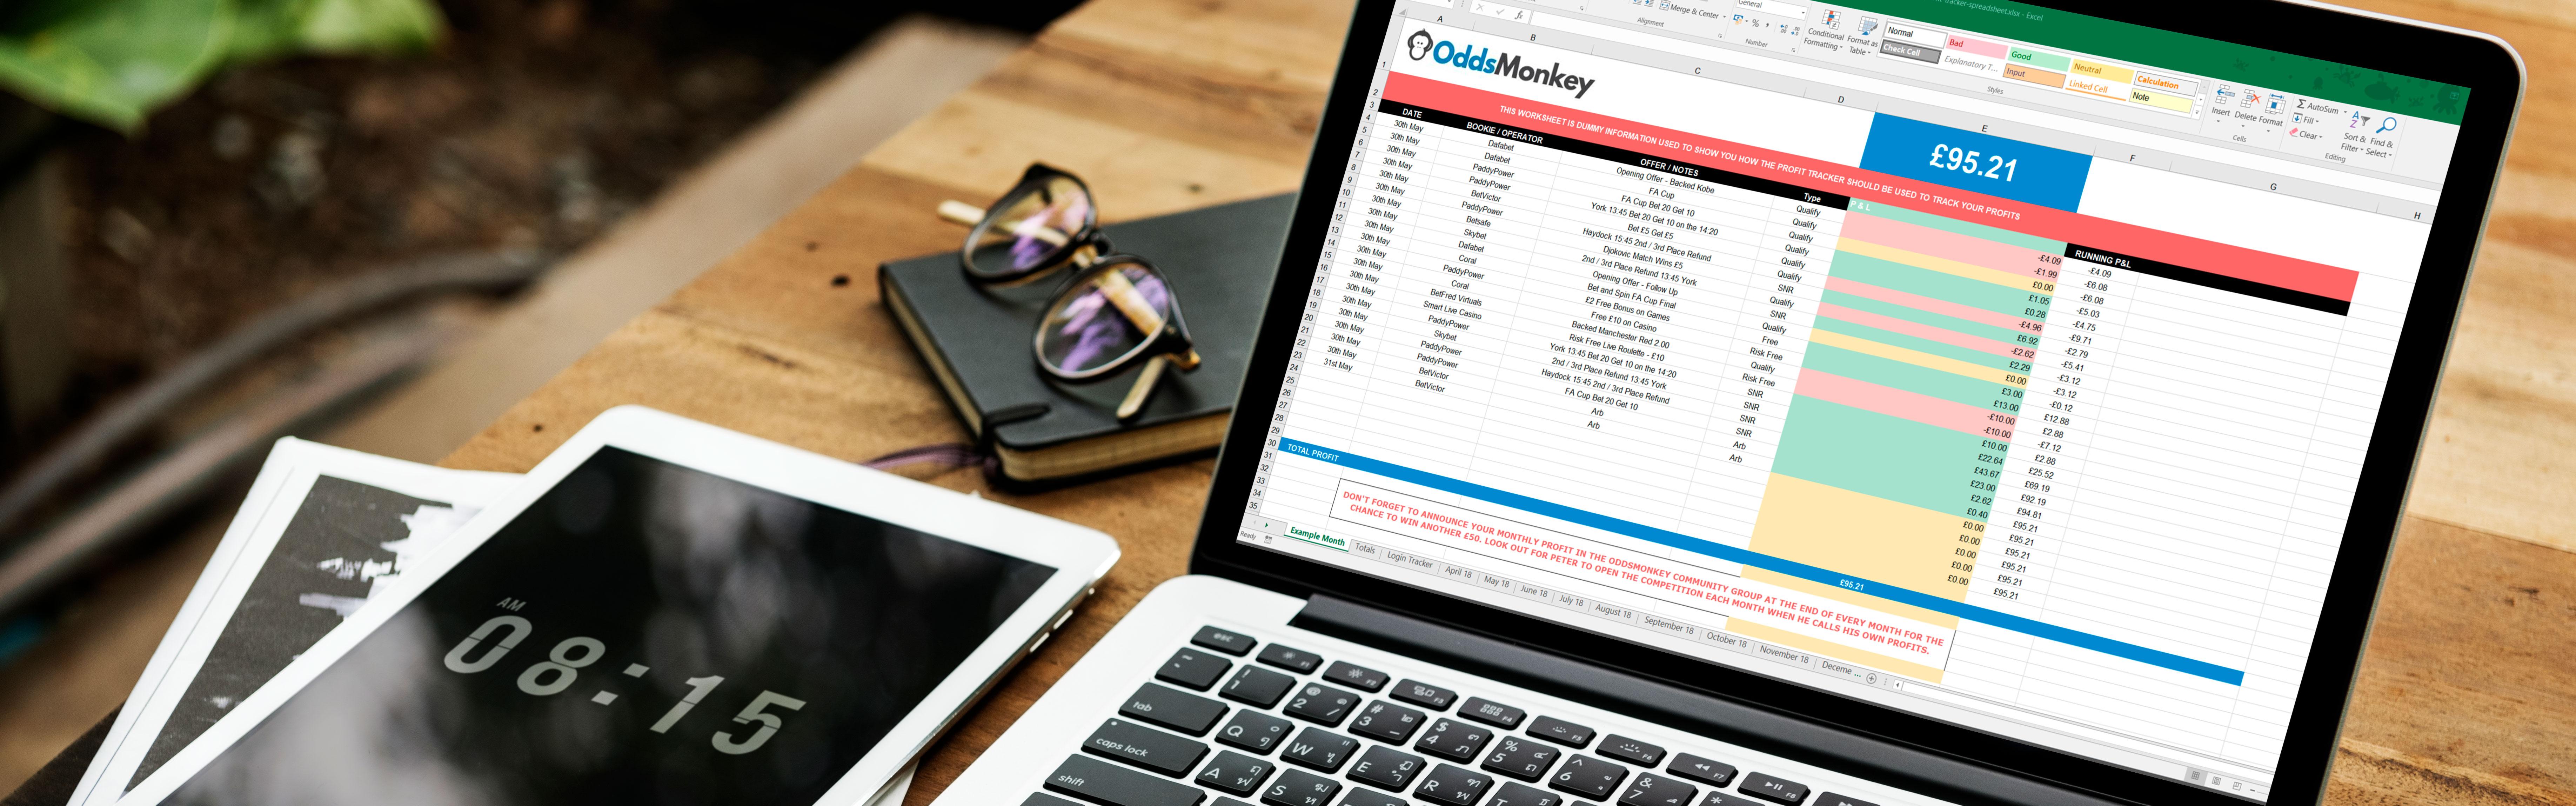 Matched Betting Spreadsheet Excel Regarding Free Matched Betting Spreadsheet  Oddsmonkey Blog